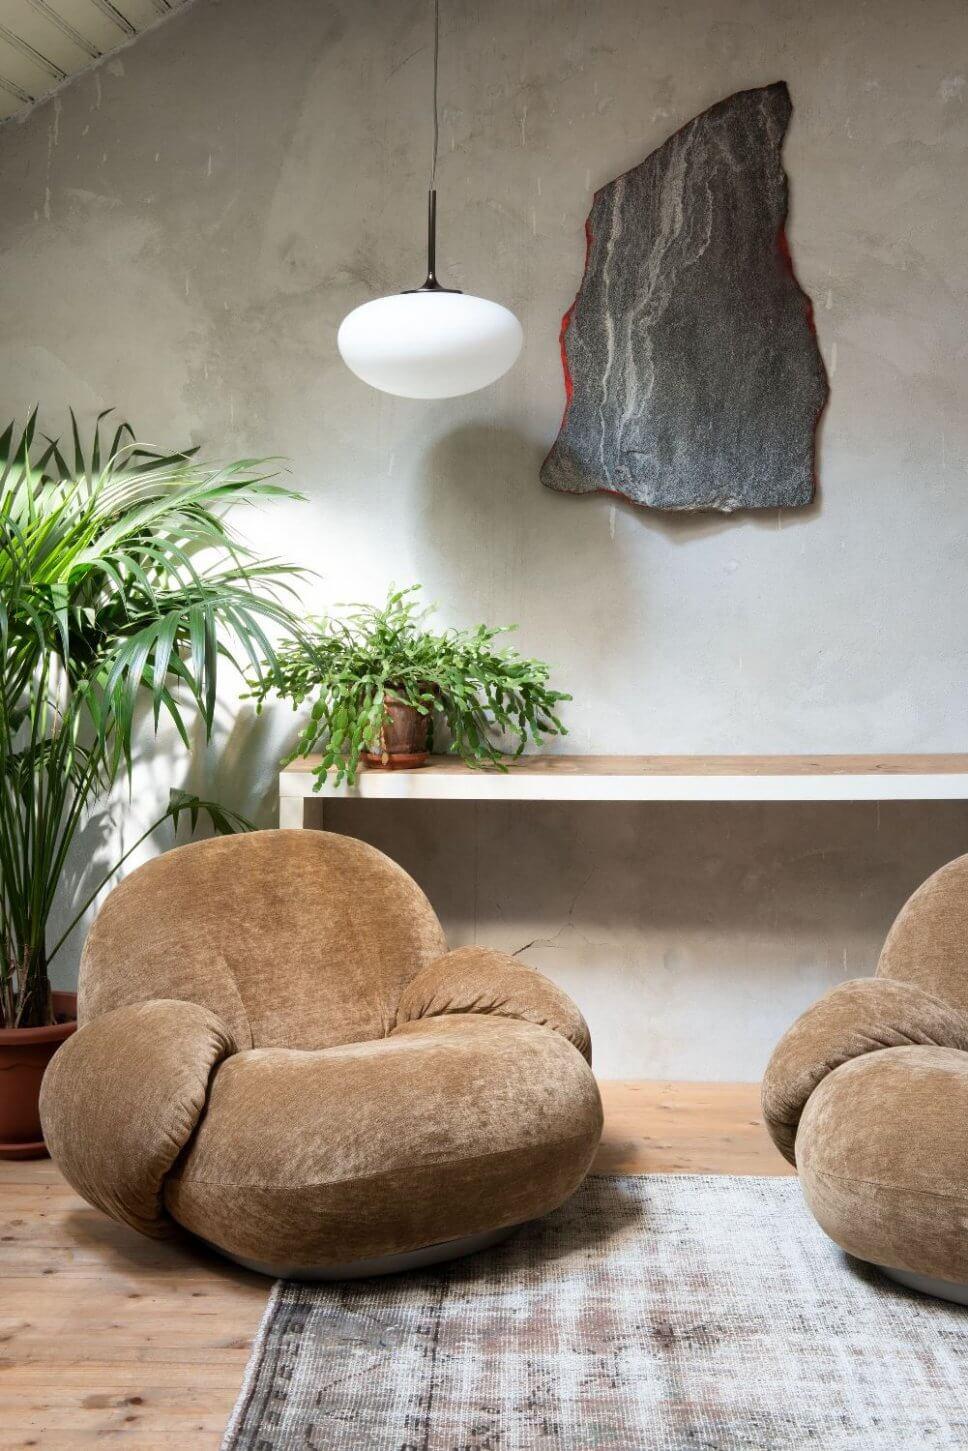 Samtsessel in modernem Wohnzimmer